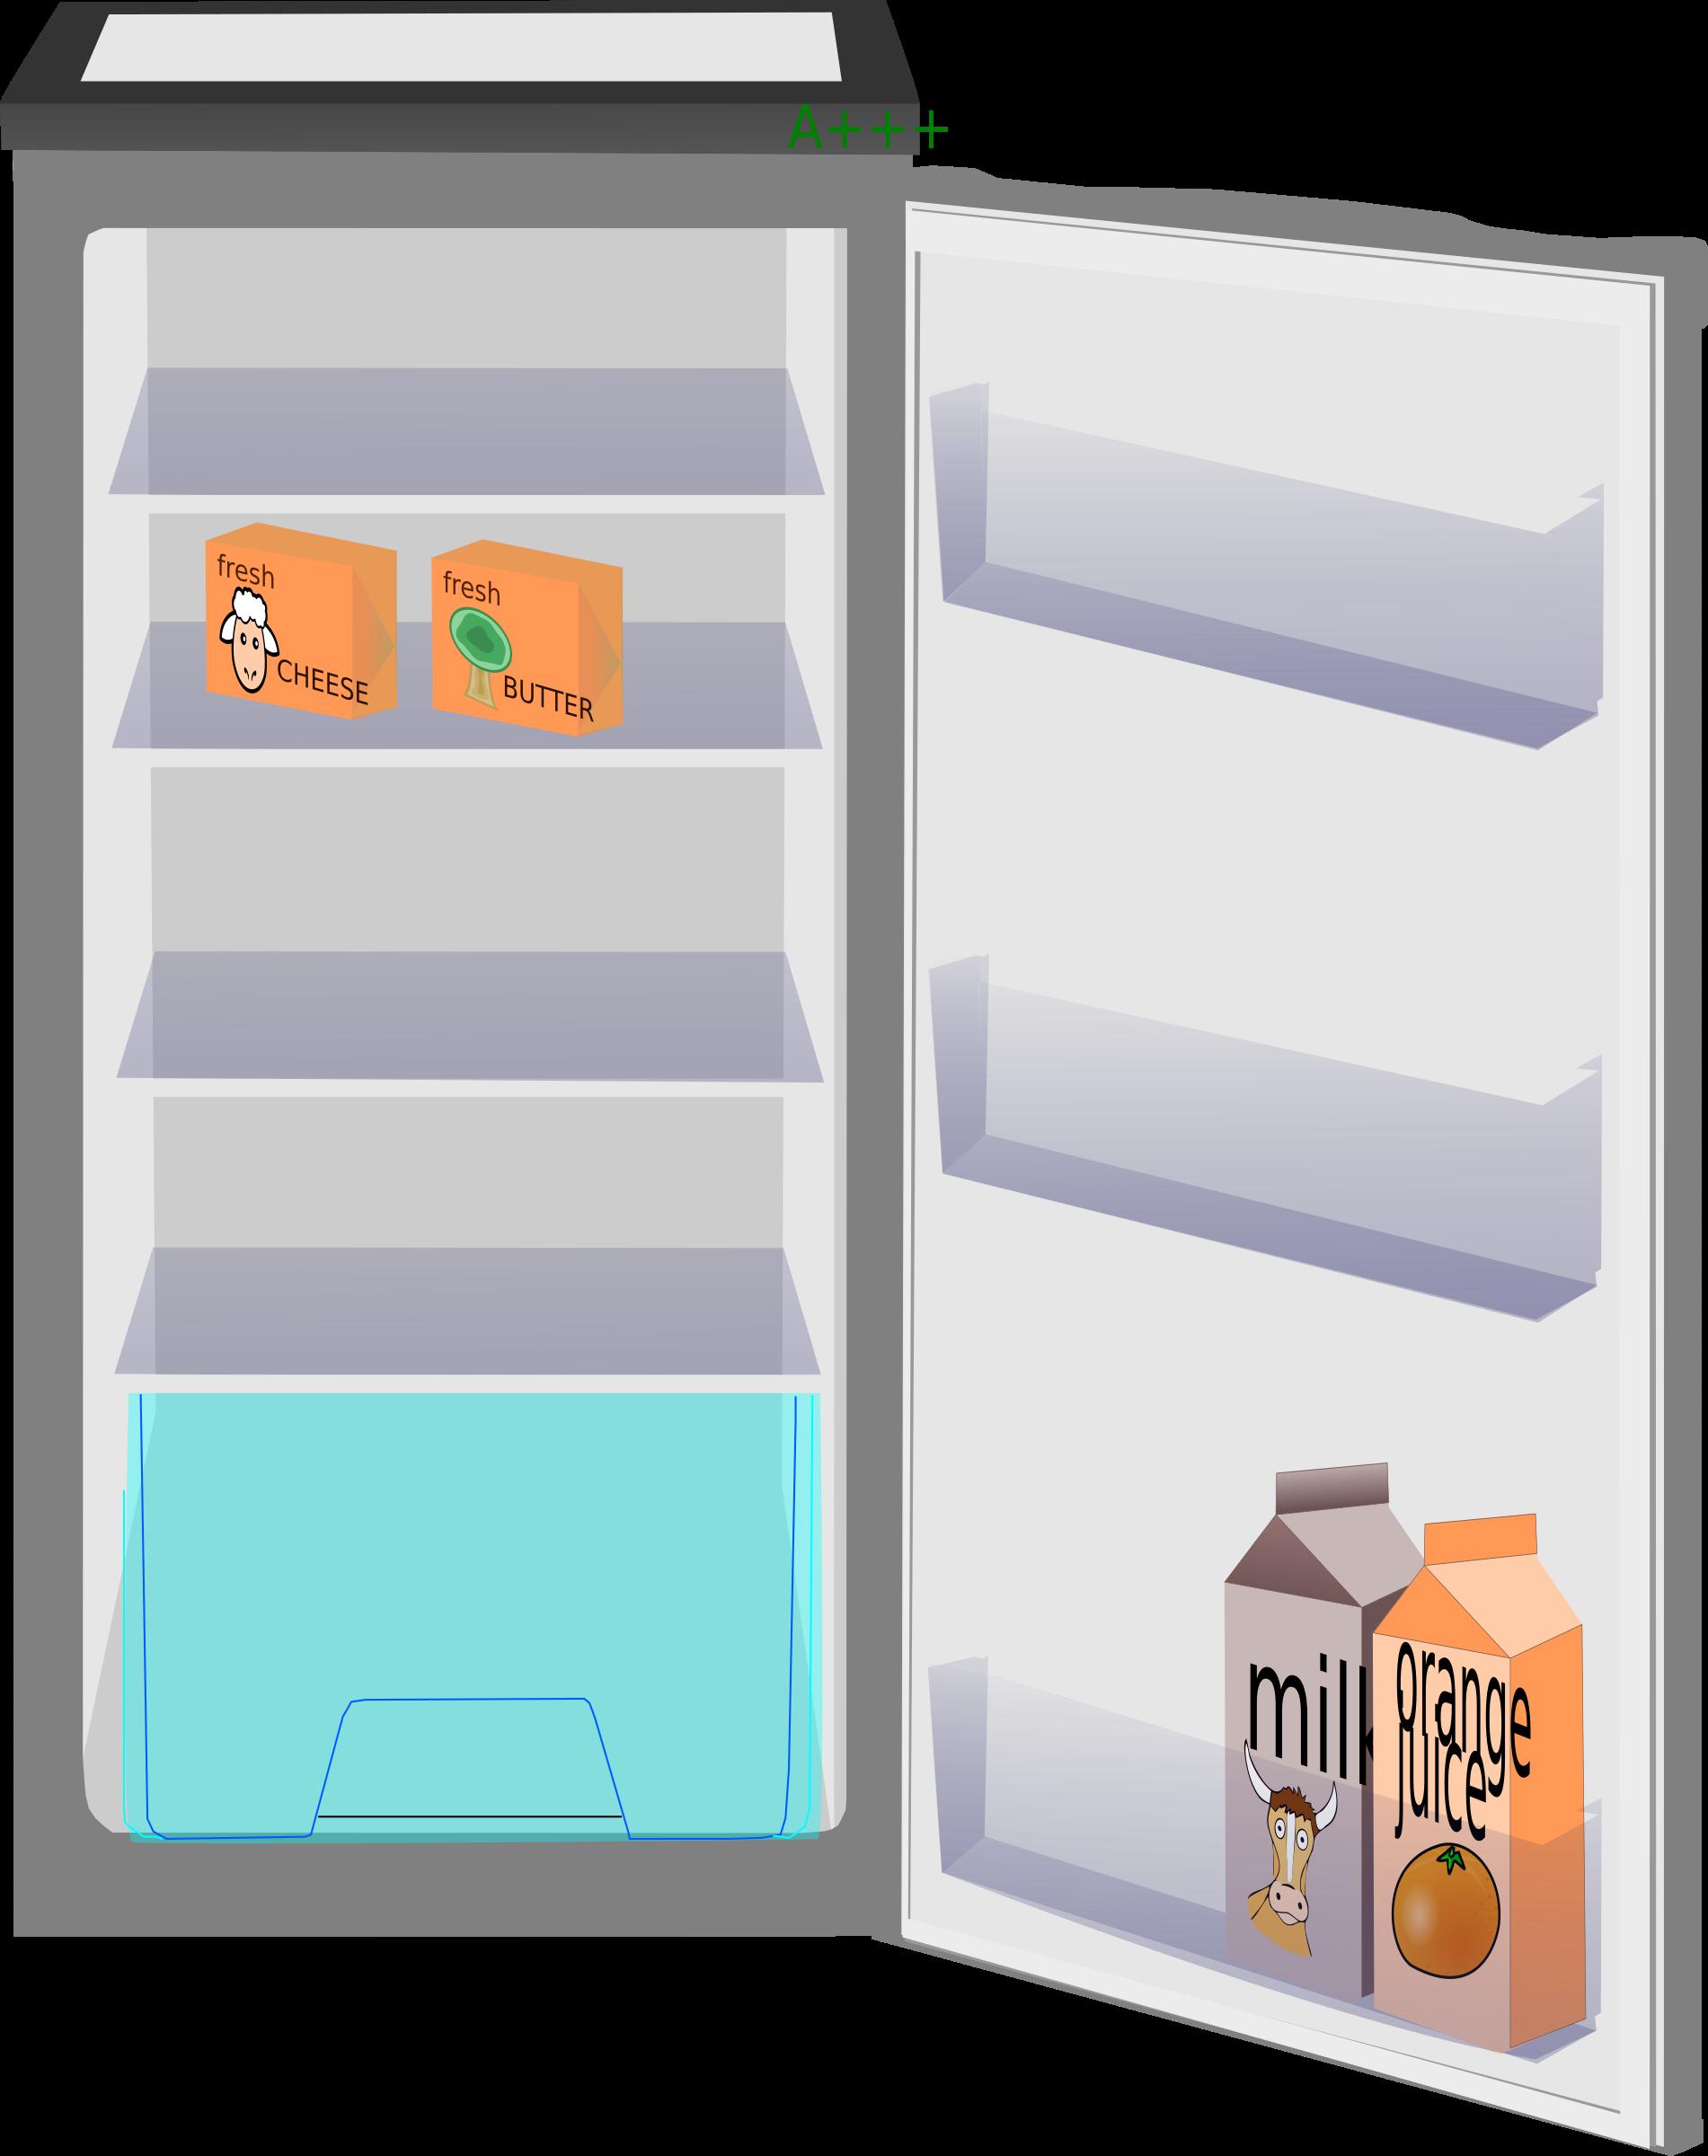 Free Refrigerator Open Cliparts, Download Free Clip Art.